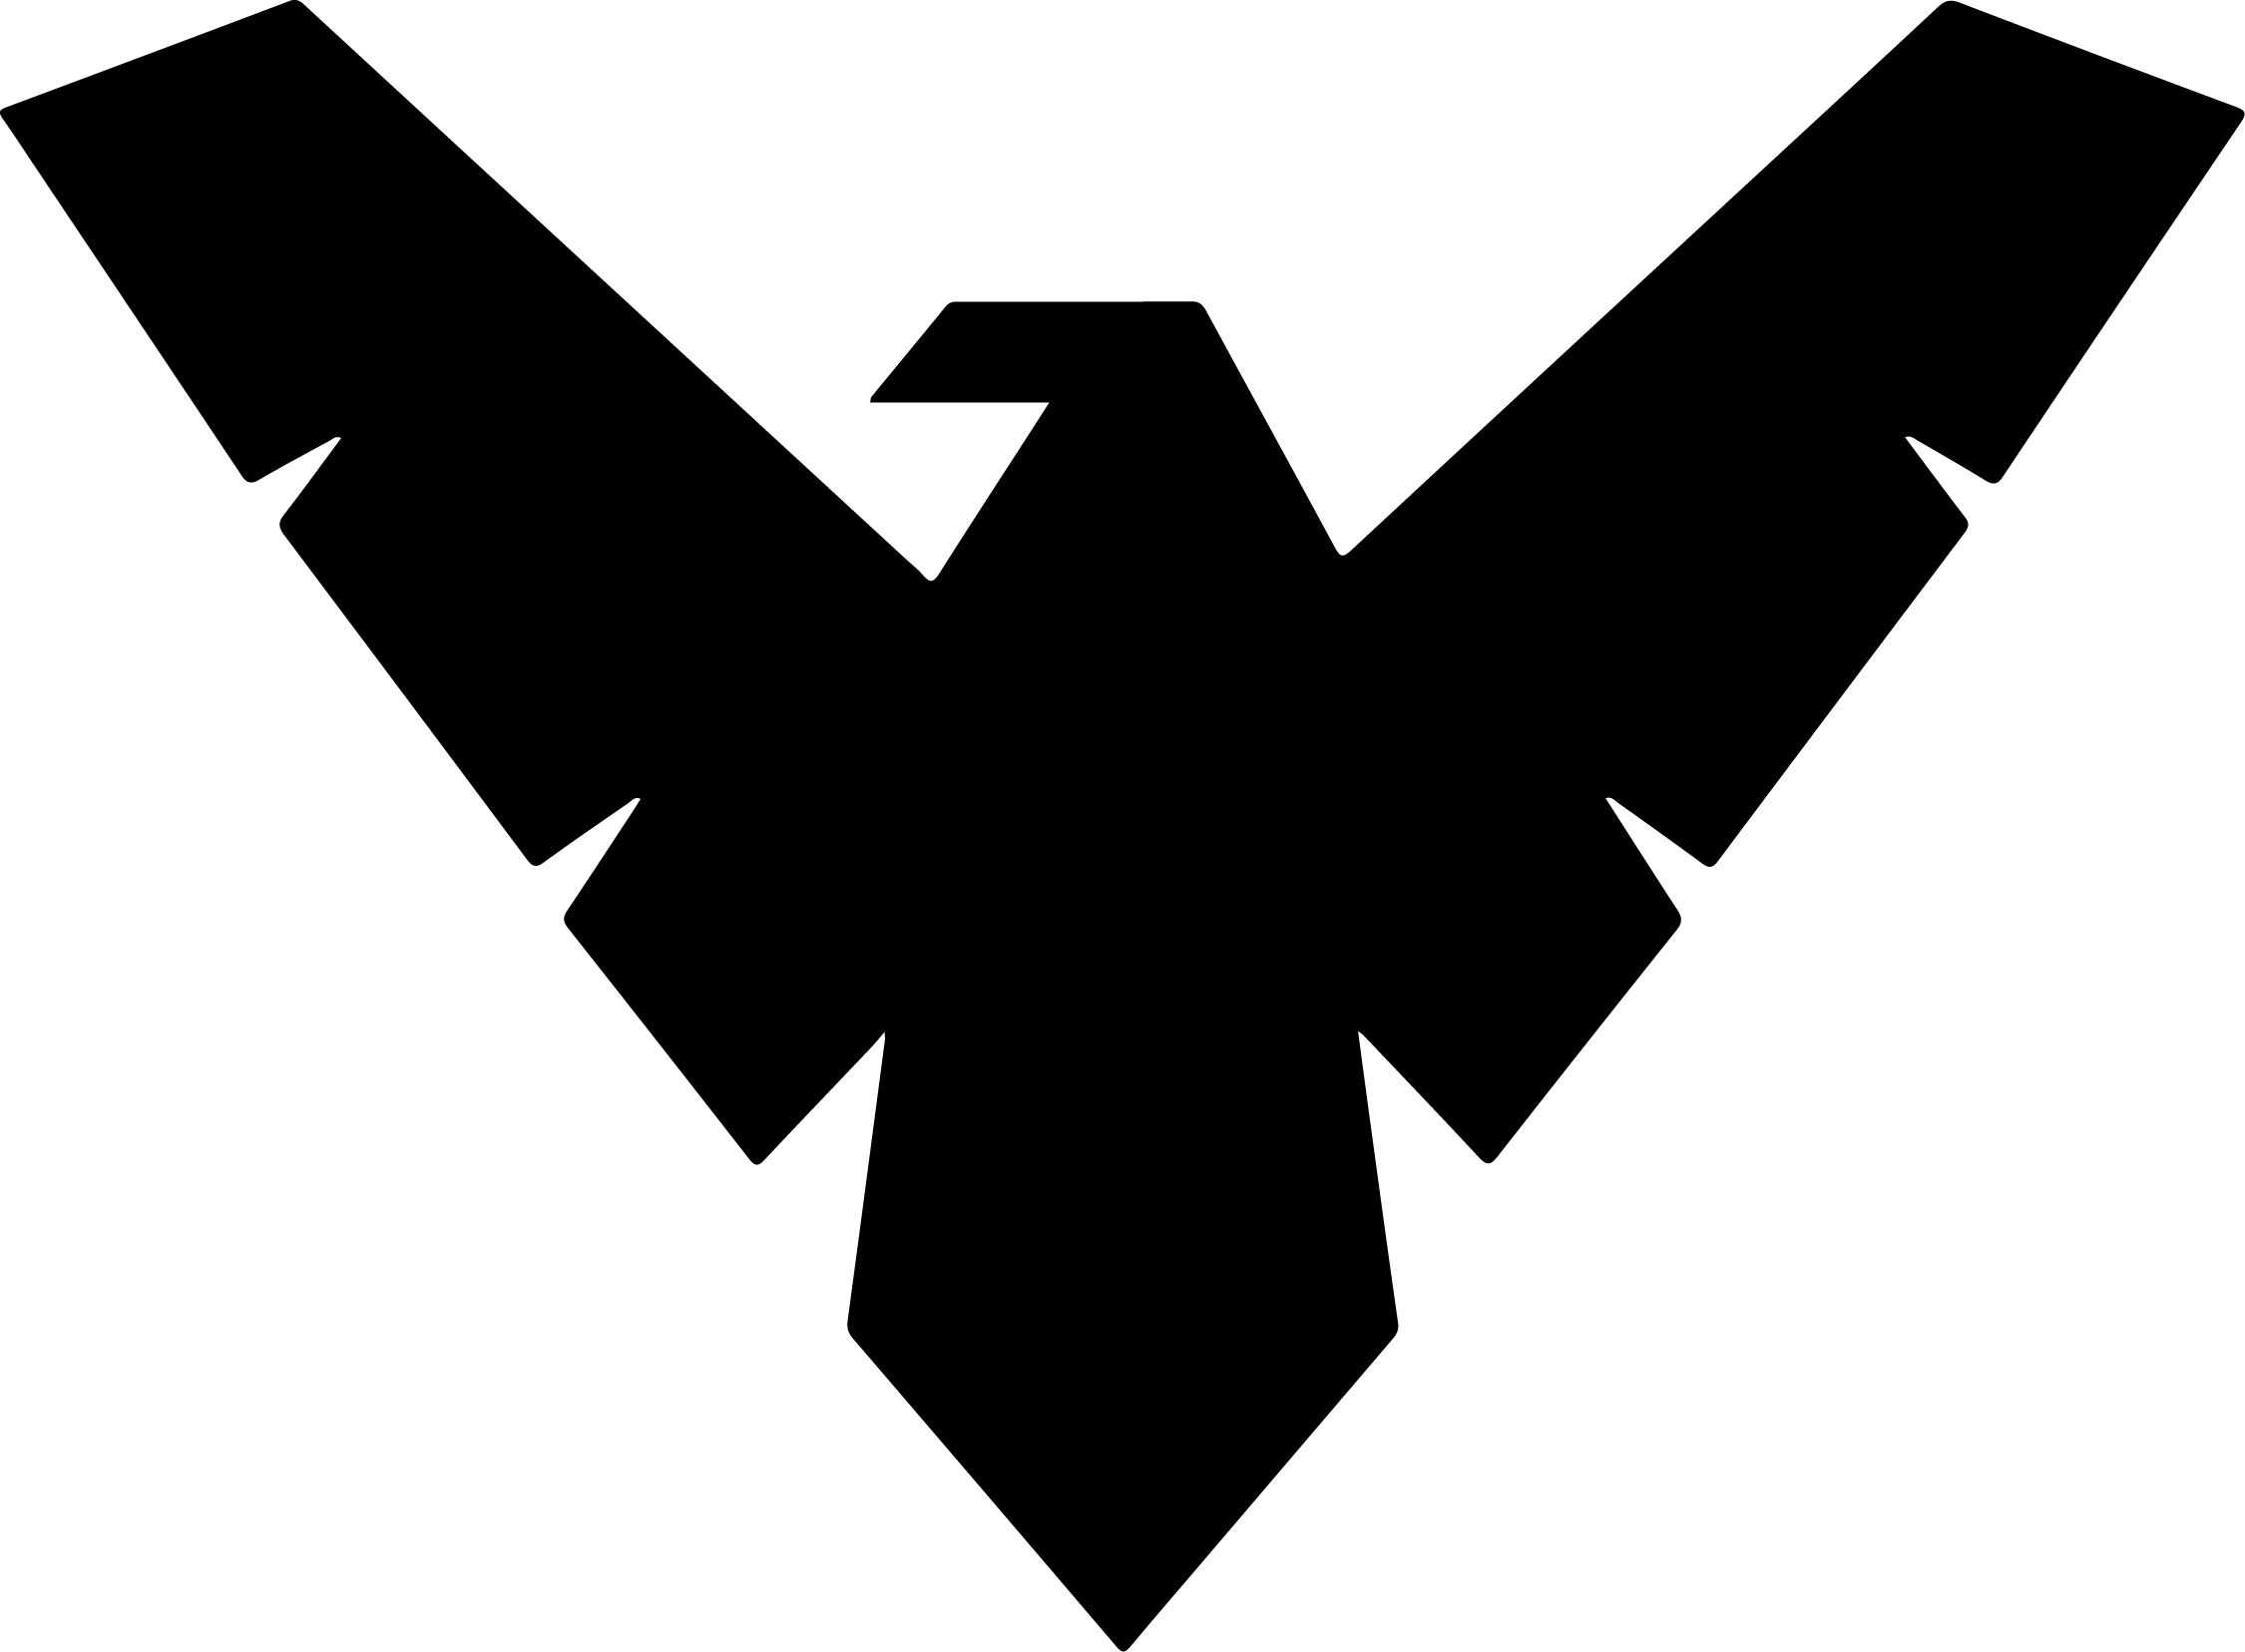 Nightwing Logo Sticker Logo Sticker Vinyl Decal Stickers Nightwing